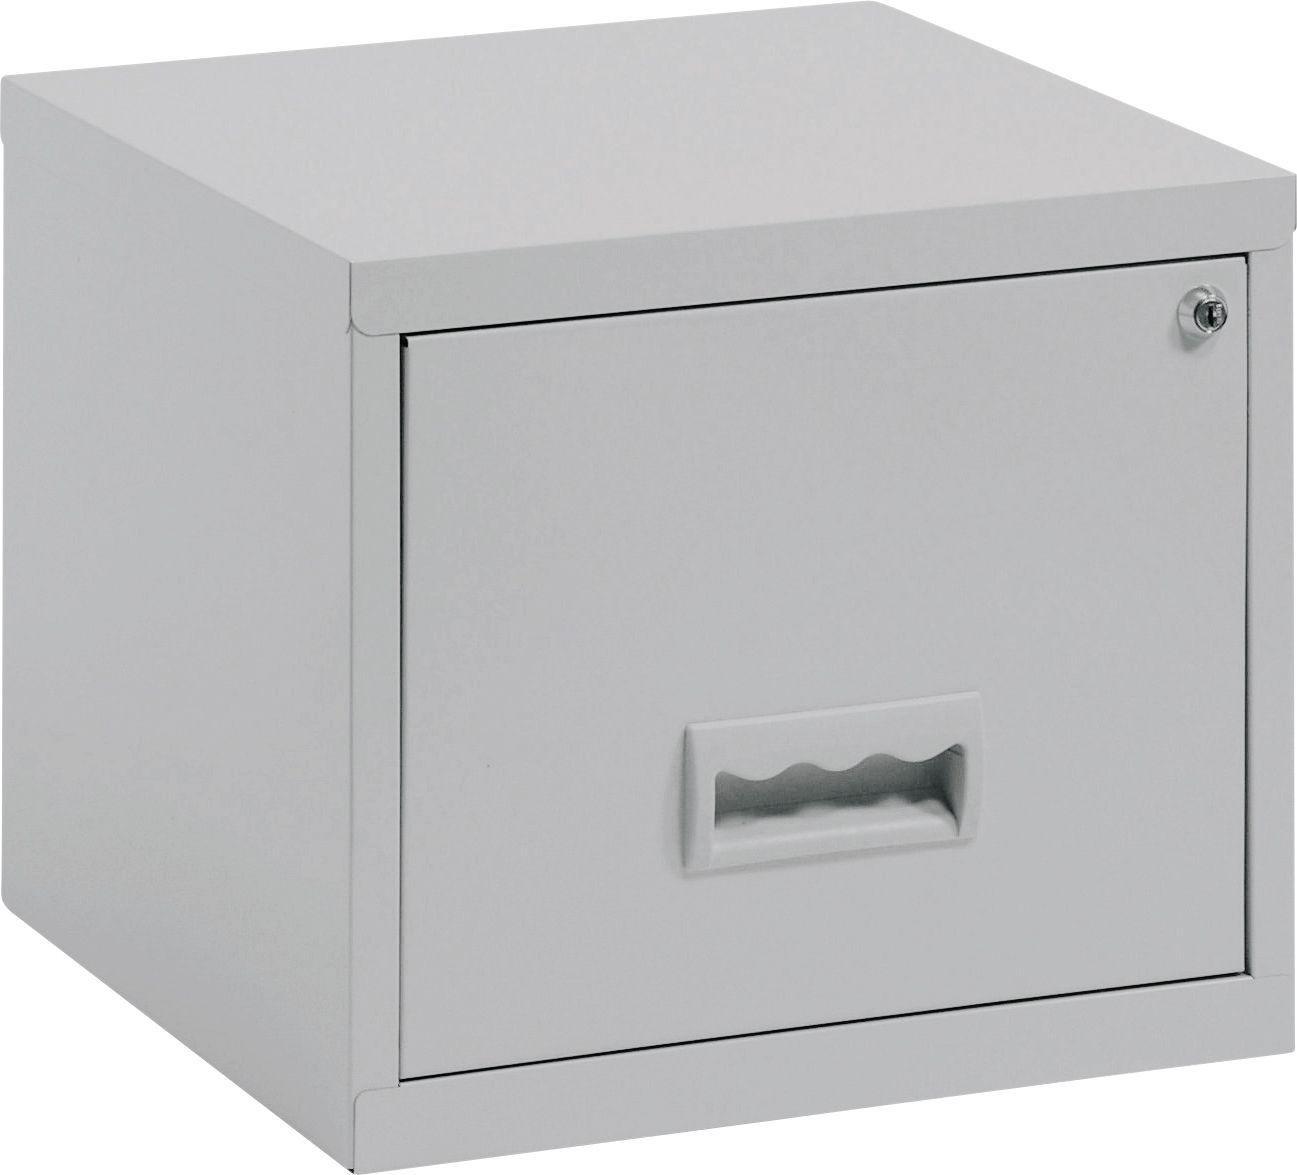 Pierre Henry - 1 Drawer Filing Cabinet - Grey